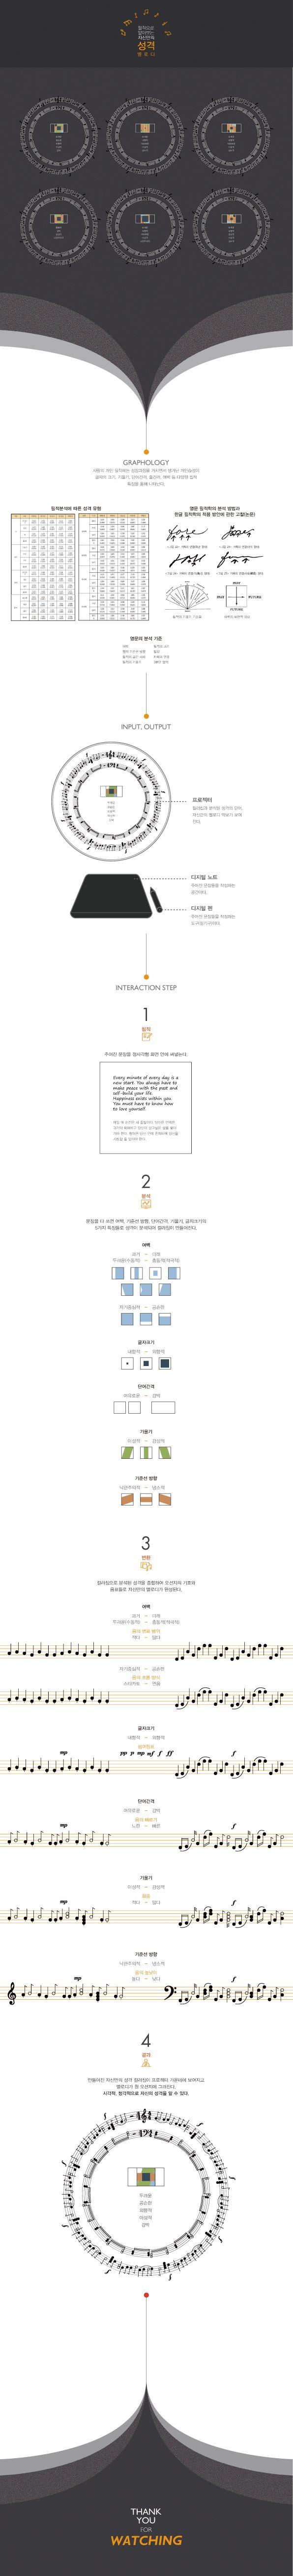 Lee Ji Yeon ㅣ Graphology Melody   Information Visualization 2016│ Major in Digital Media Design │#hicoda │hicoda.hongik.ac.kr